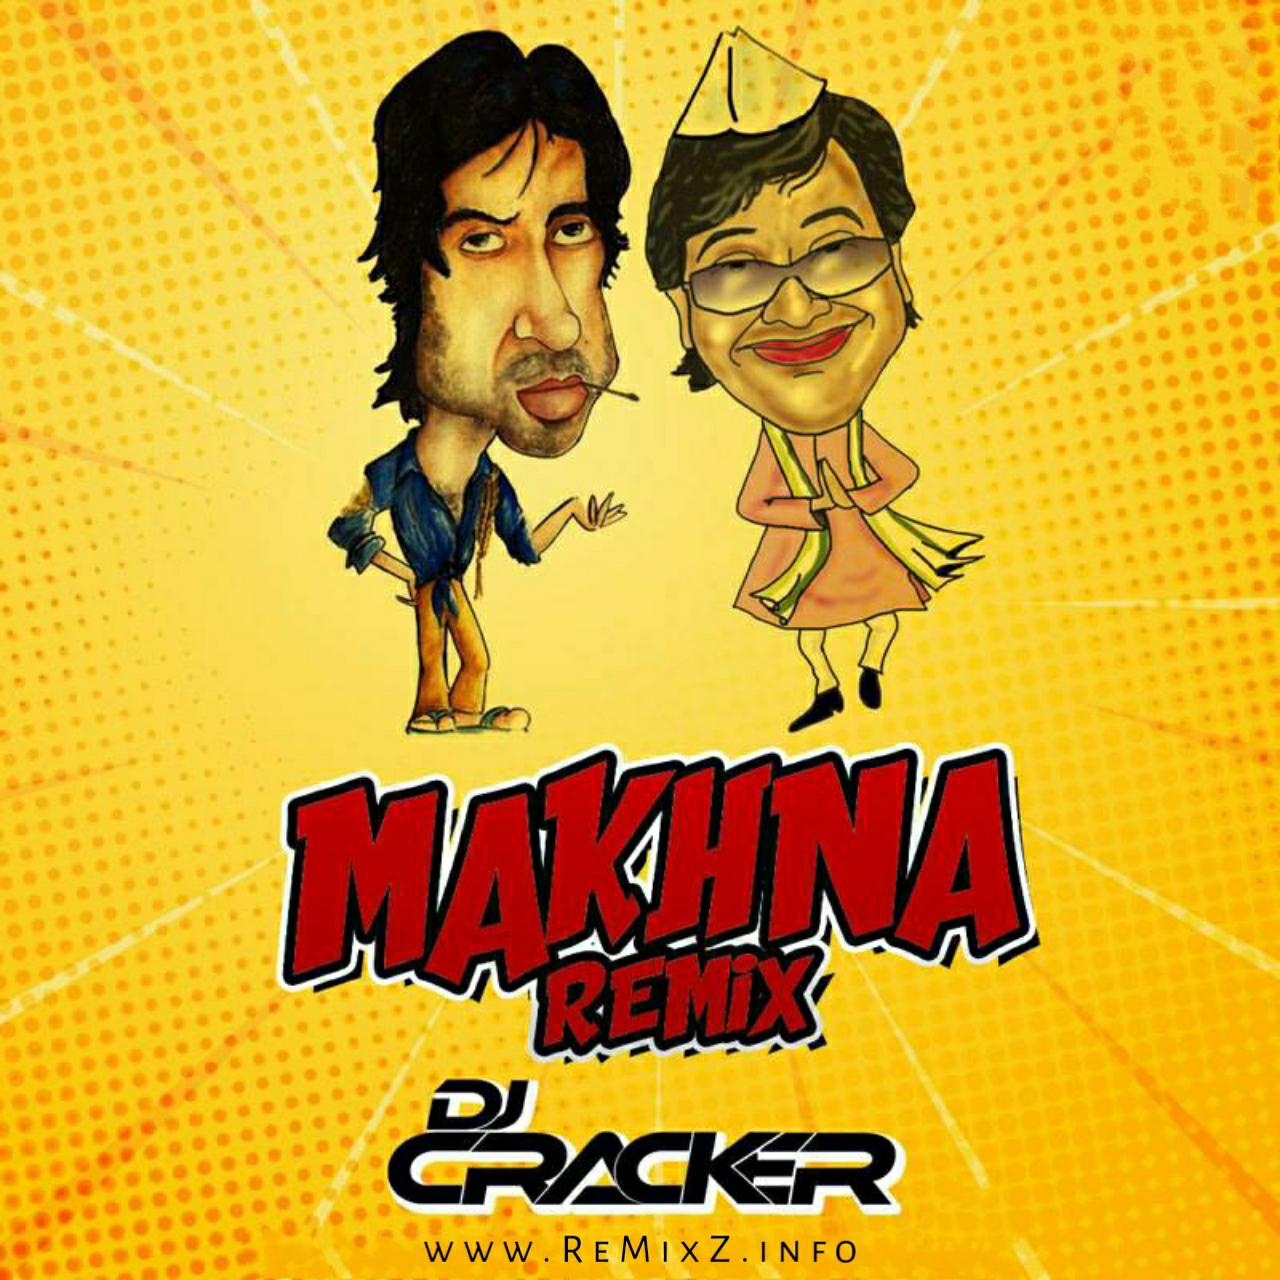 makhna-remix-dj-cracker.jpg